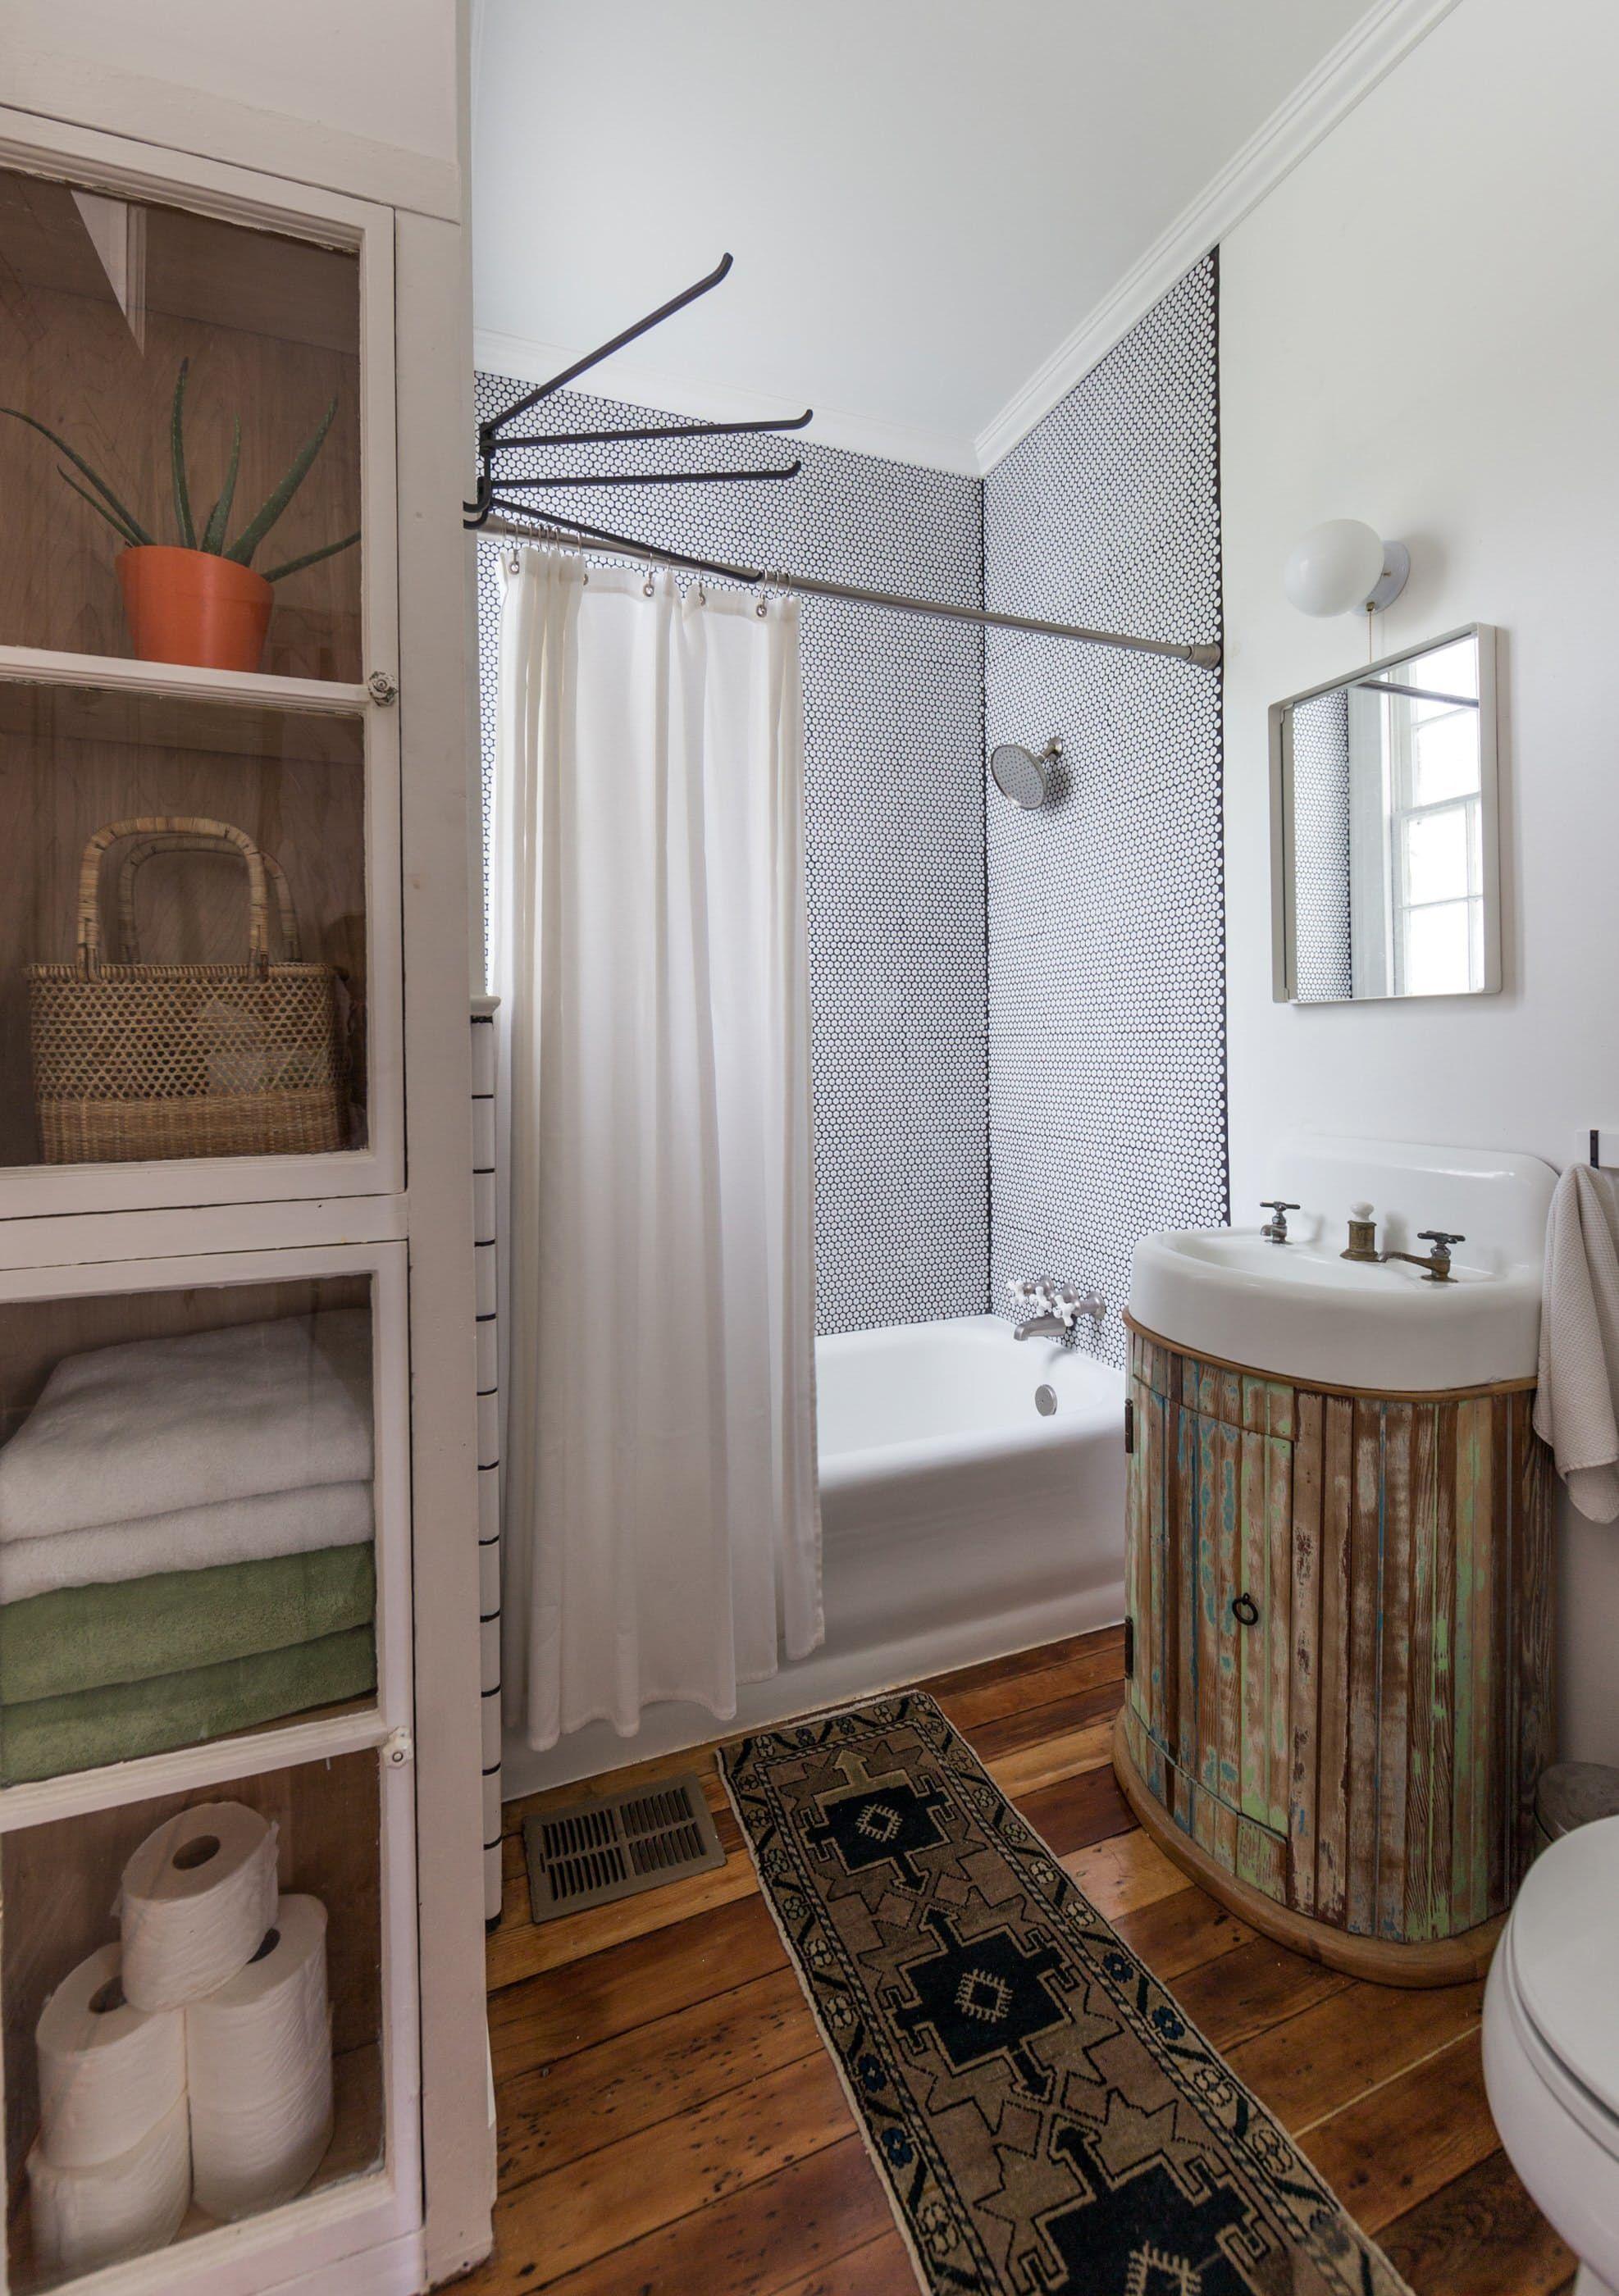 Take A Virtual Stroll Through Beautiful New Orleans Homes Home - Bathroom renovation new orleans for bathroom decor ideas